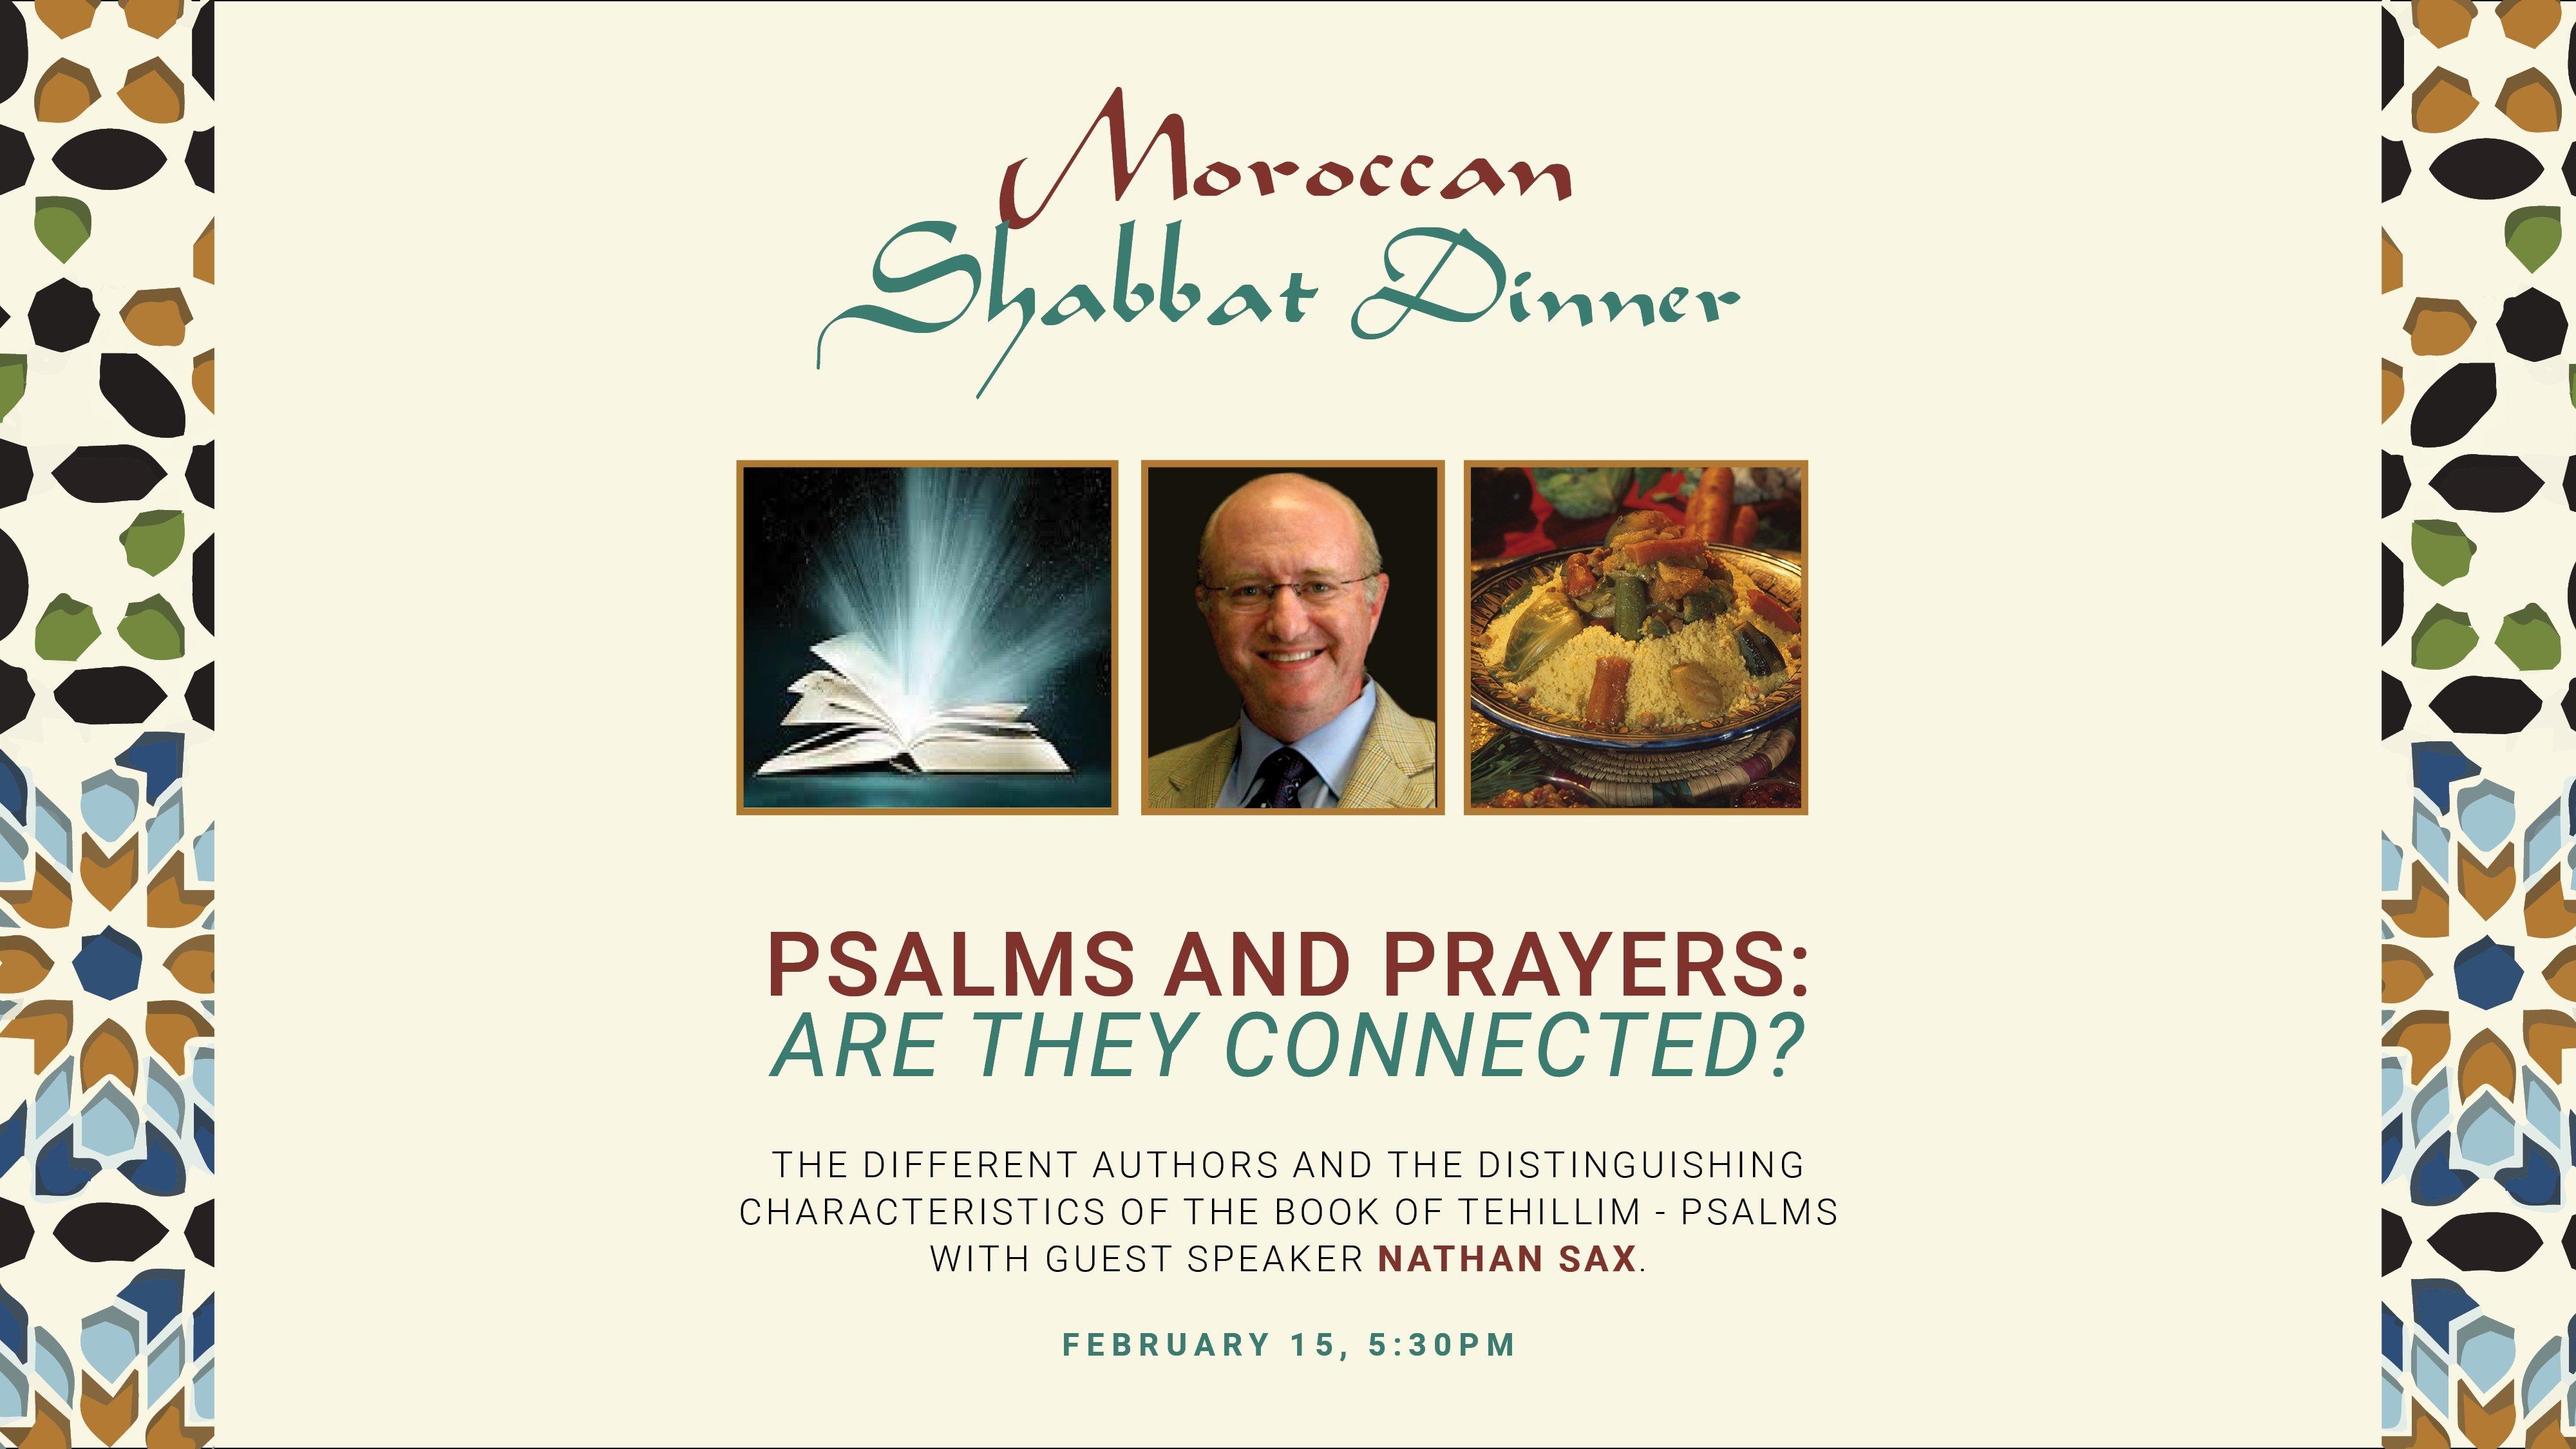 Moroccan Shabbat Dinner.jpg